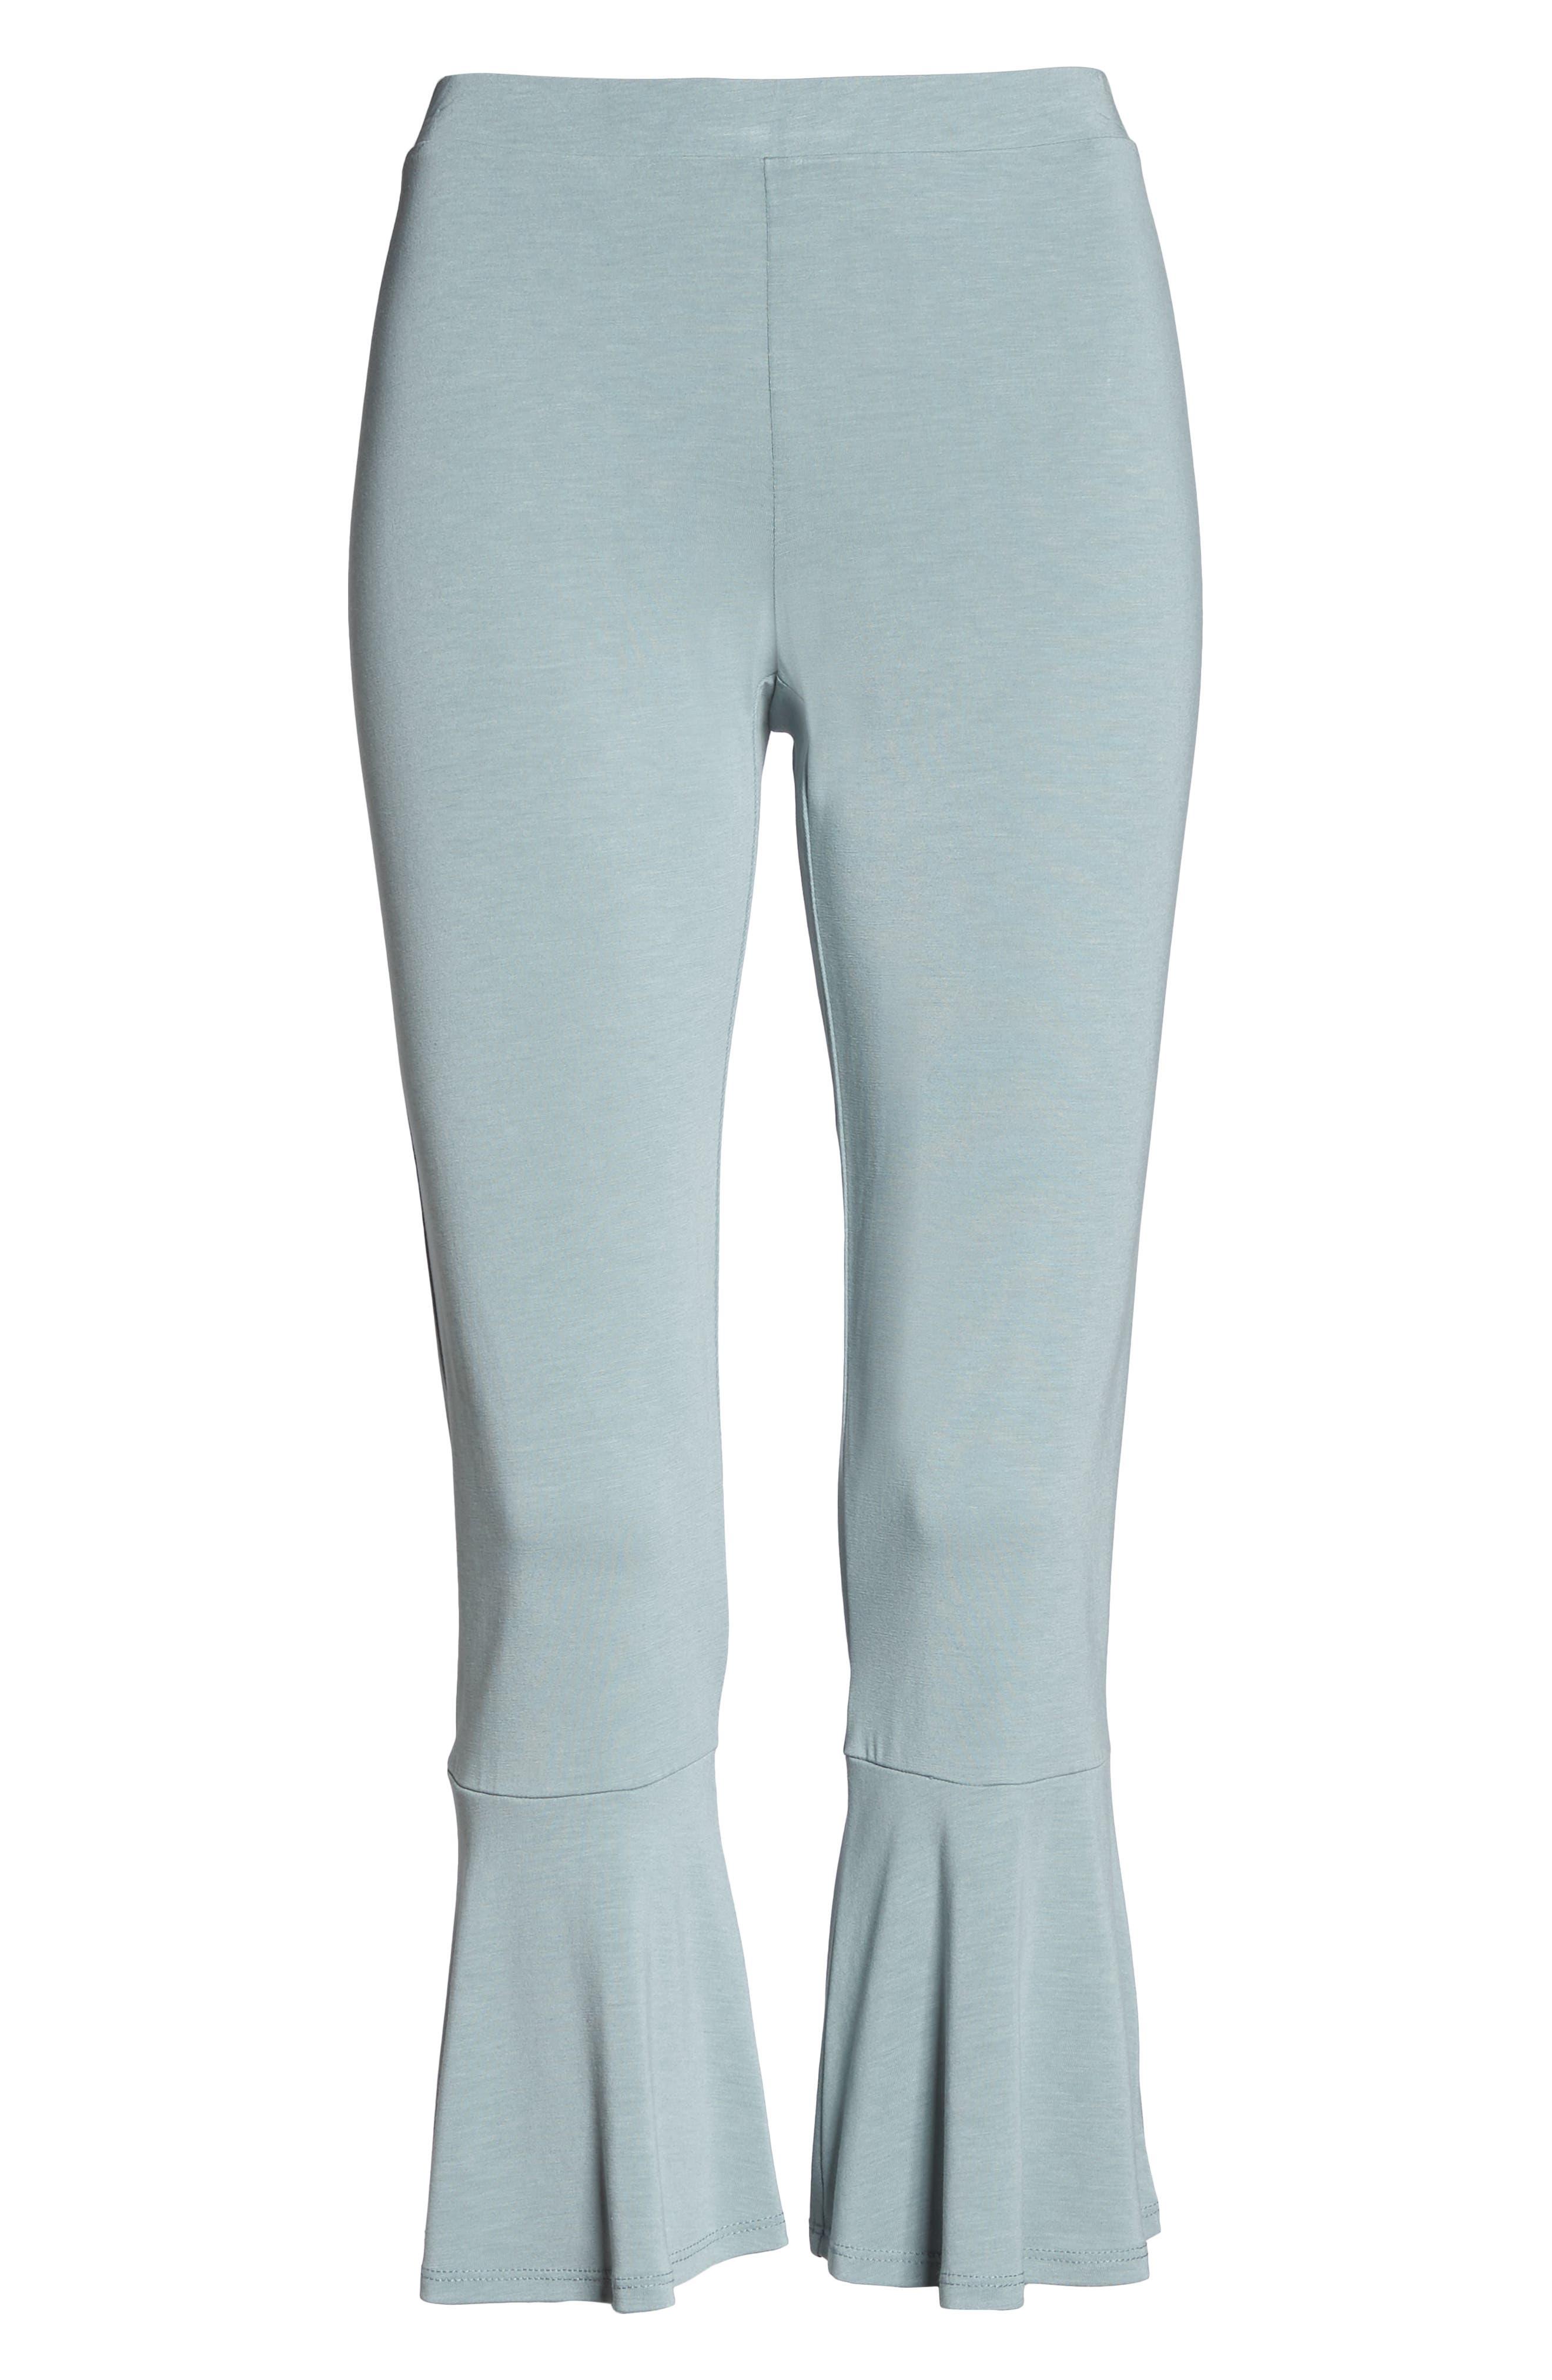 Aden Ruffle Hem Lounge Pants,                             Alternate thumbnail 6, color,                             MINERAL SAGE